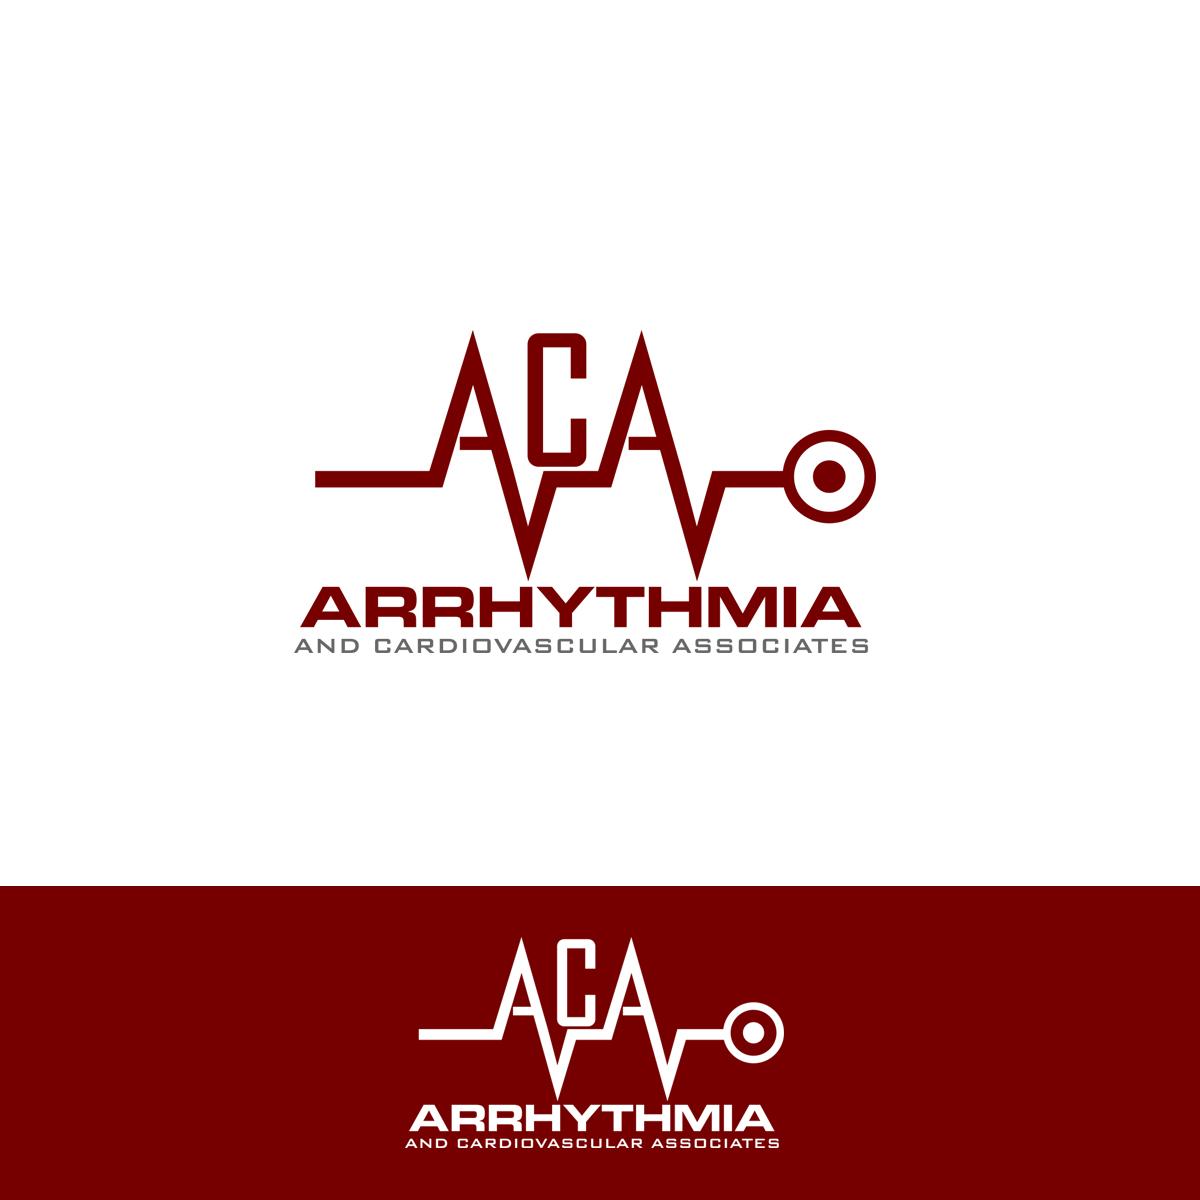 Modern, Professional, Business Logo Design for Arrhythmia